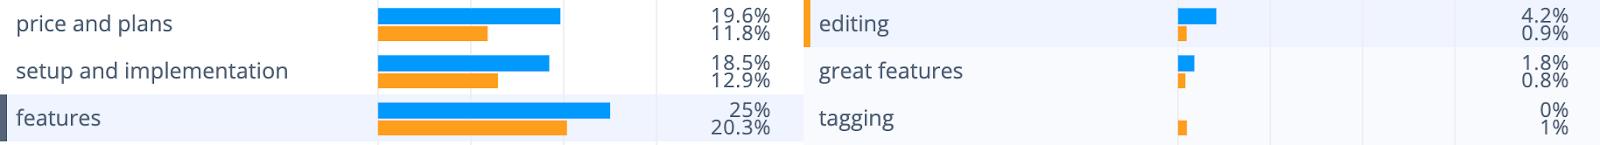 Alchemer survey tool analysis: Negative features theme data